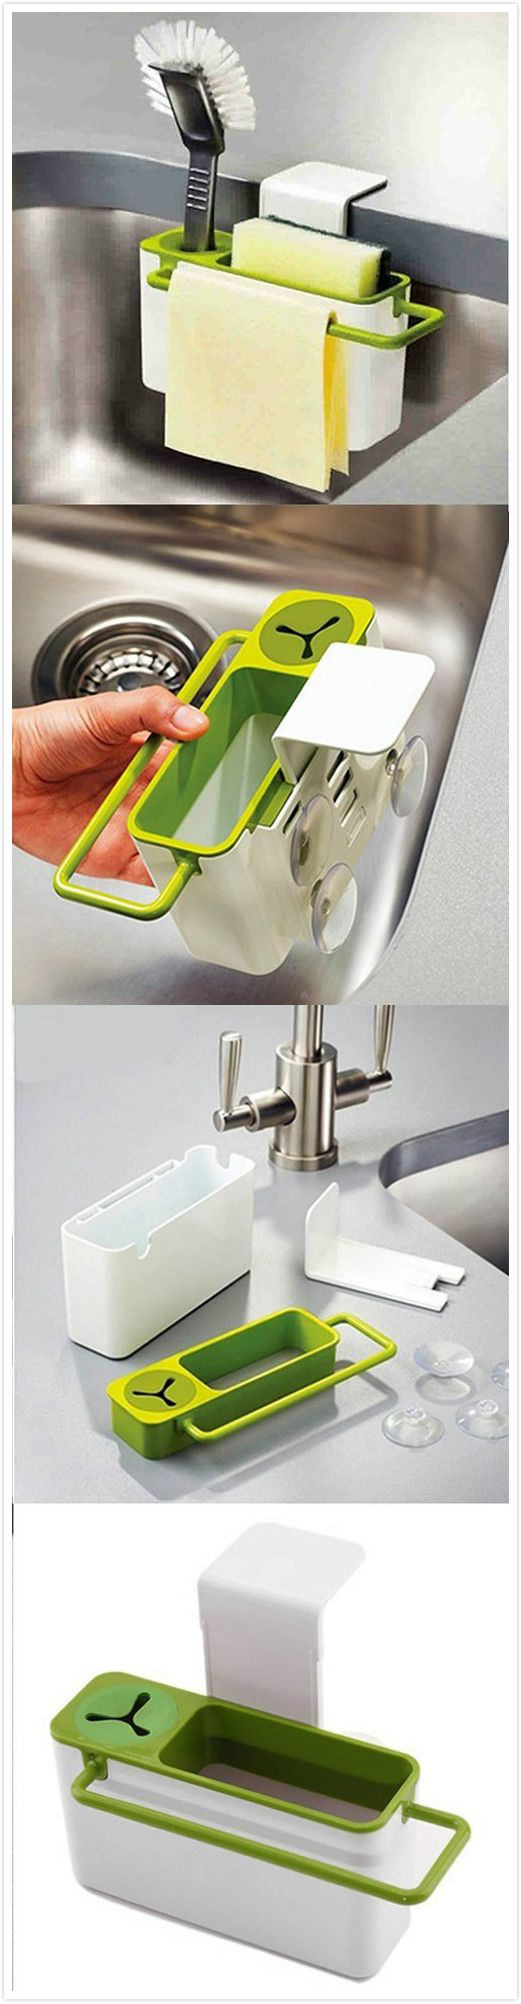 kitchen Self-draining Sink Rack Mais